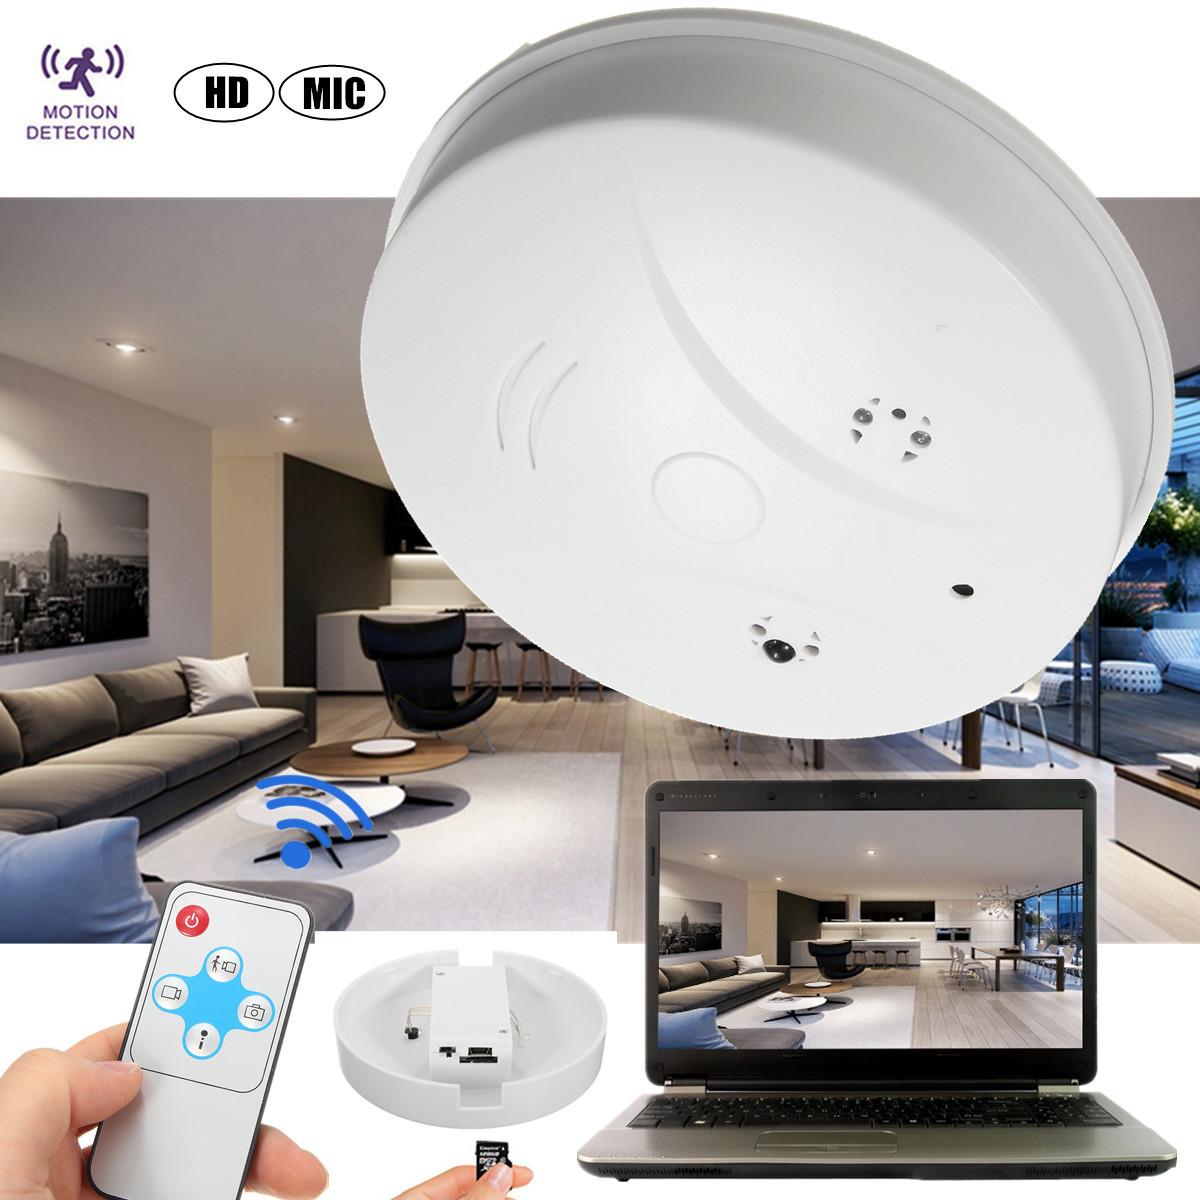 Wireless HD 1280x720P Smoke Detector Hidden Camera Motion Detector Recording DVR Camra Digital Mini Video Recorder Indoor Nanny Cam for Home Security